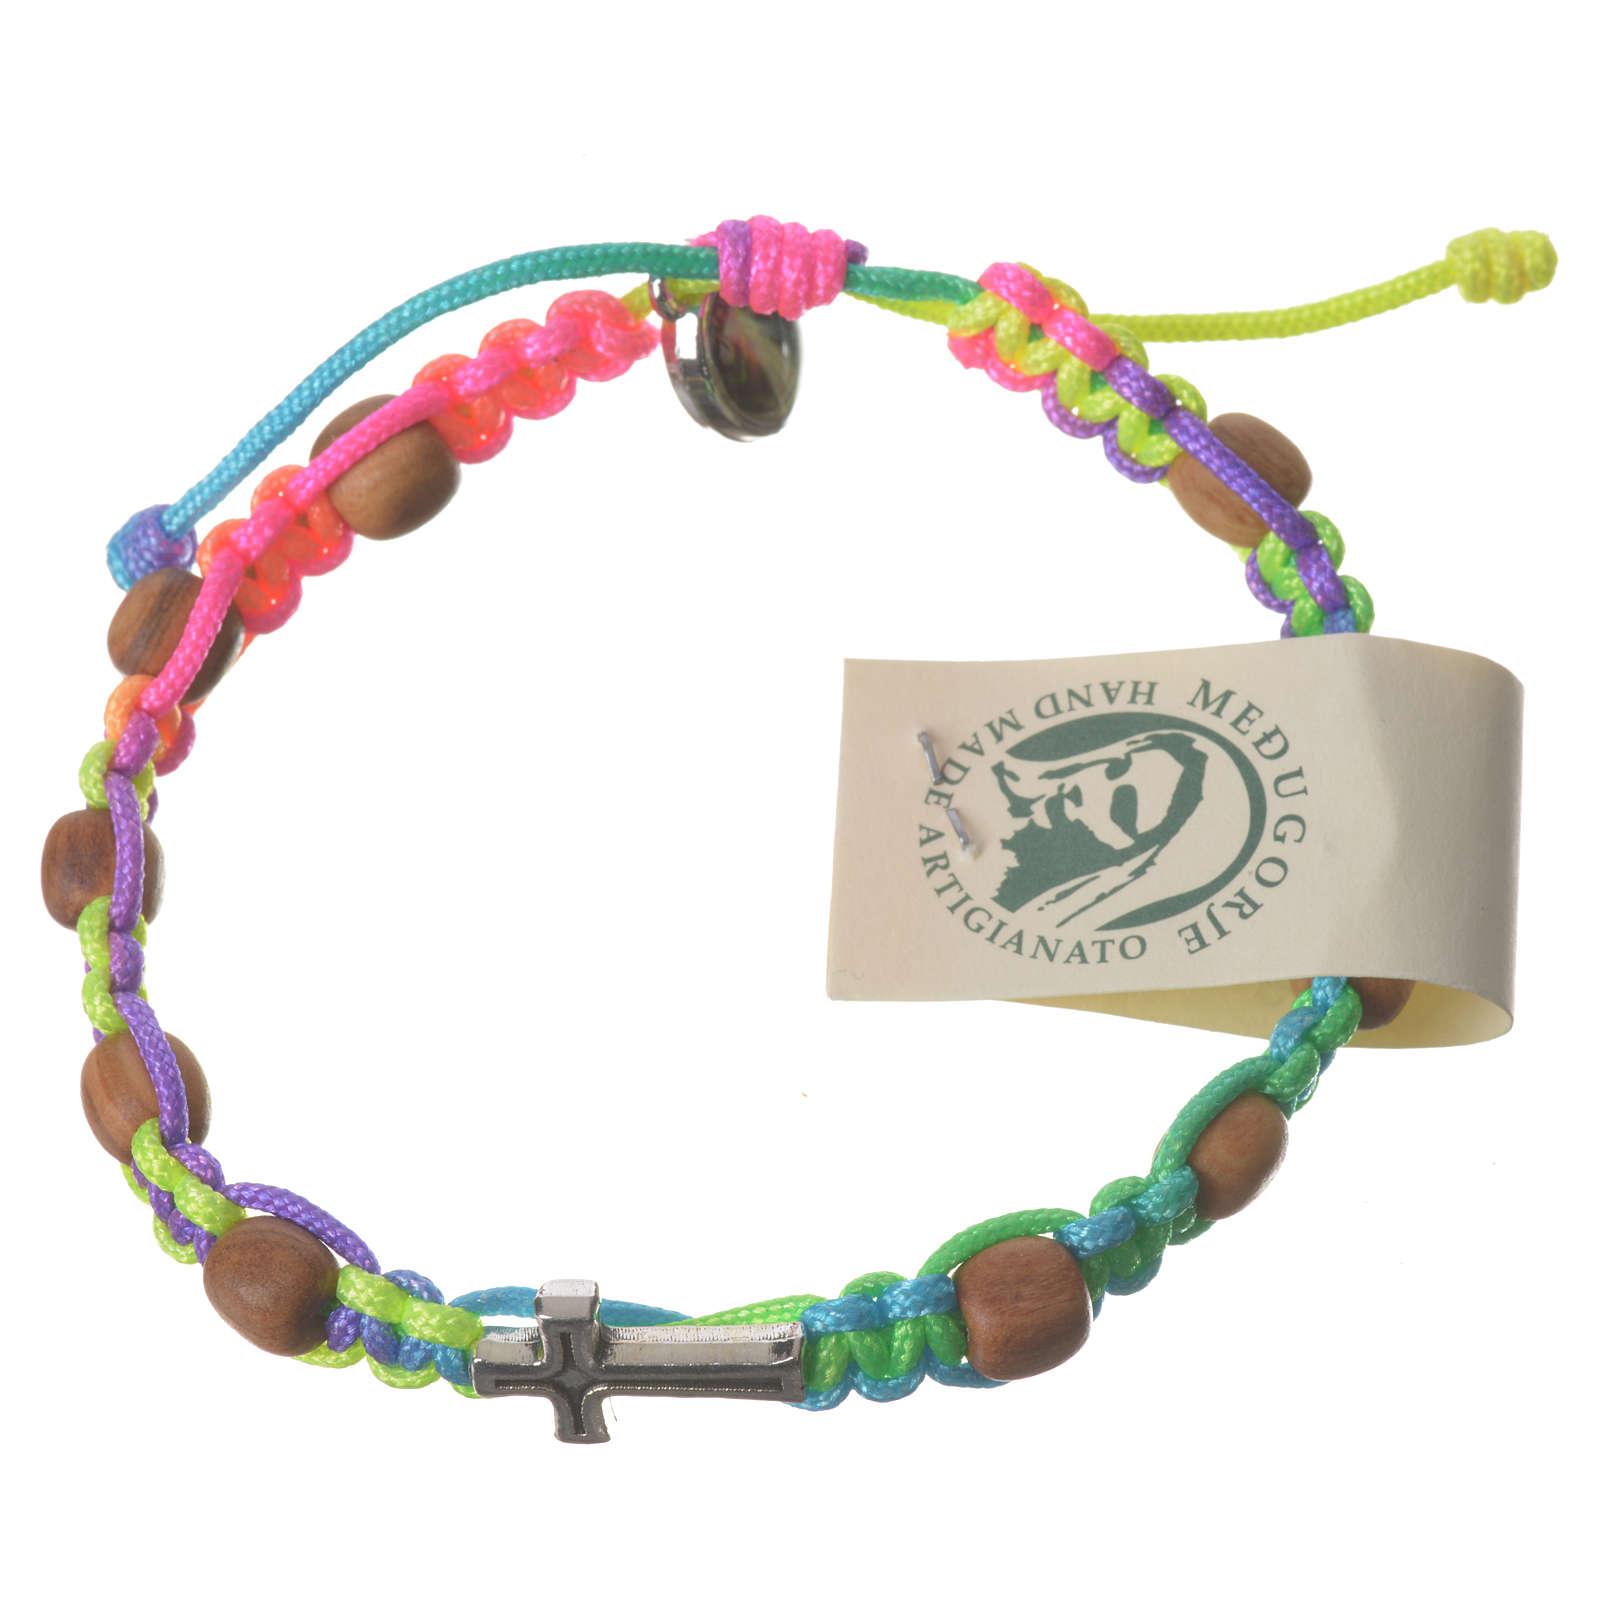 Bracciale Medjugorje corda multicolor grani ulivo 4